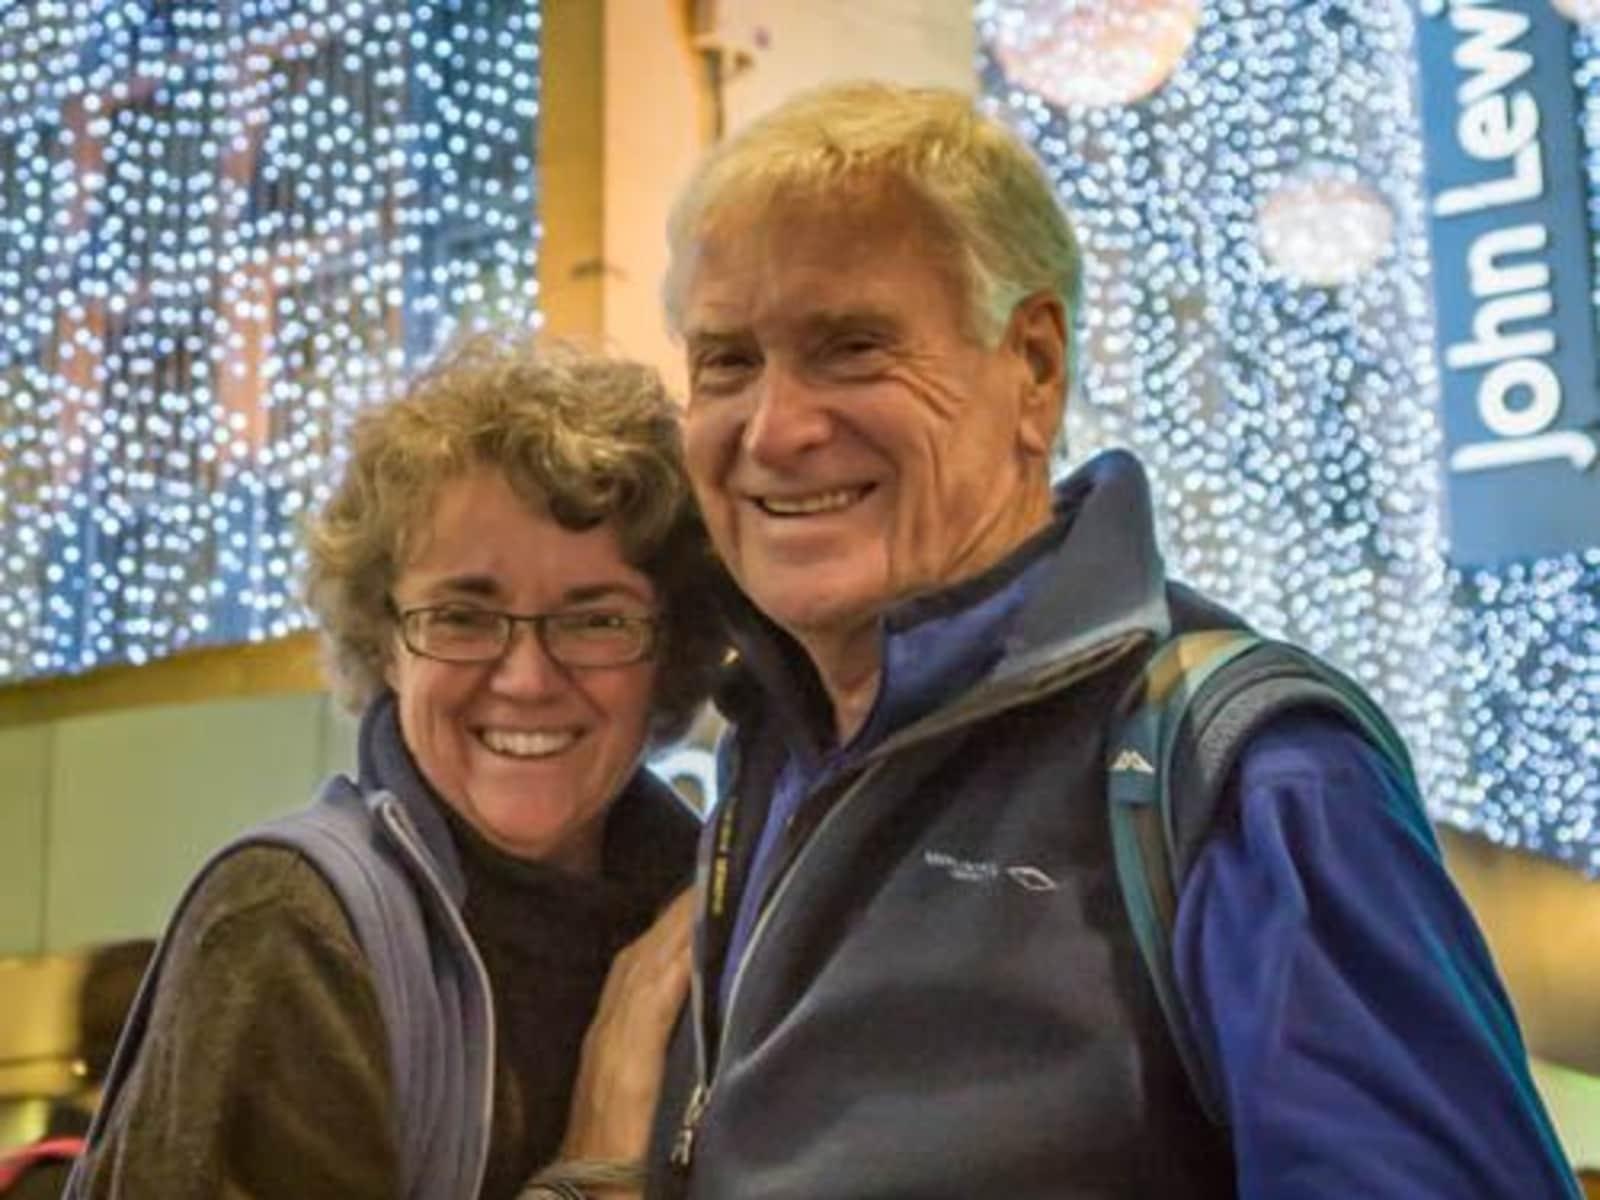 Rosemary & John from Melbourne, Victoria, Australia